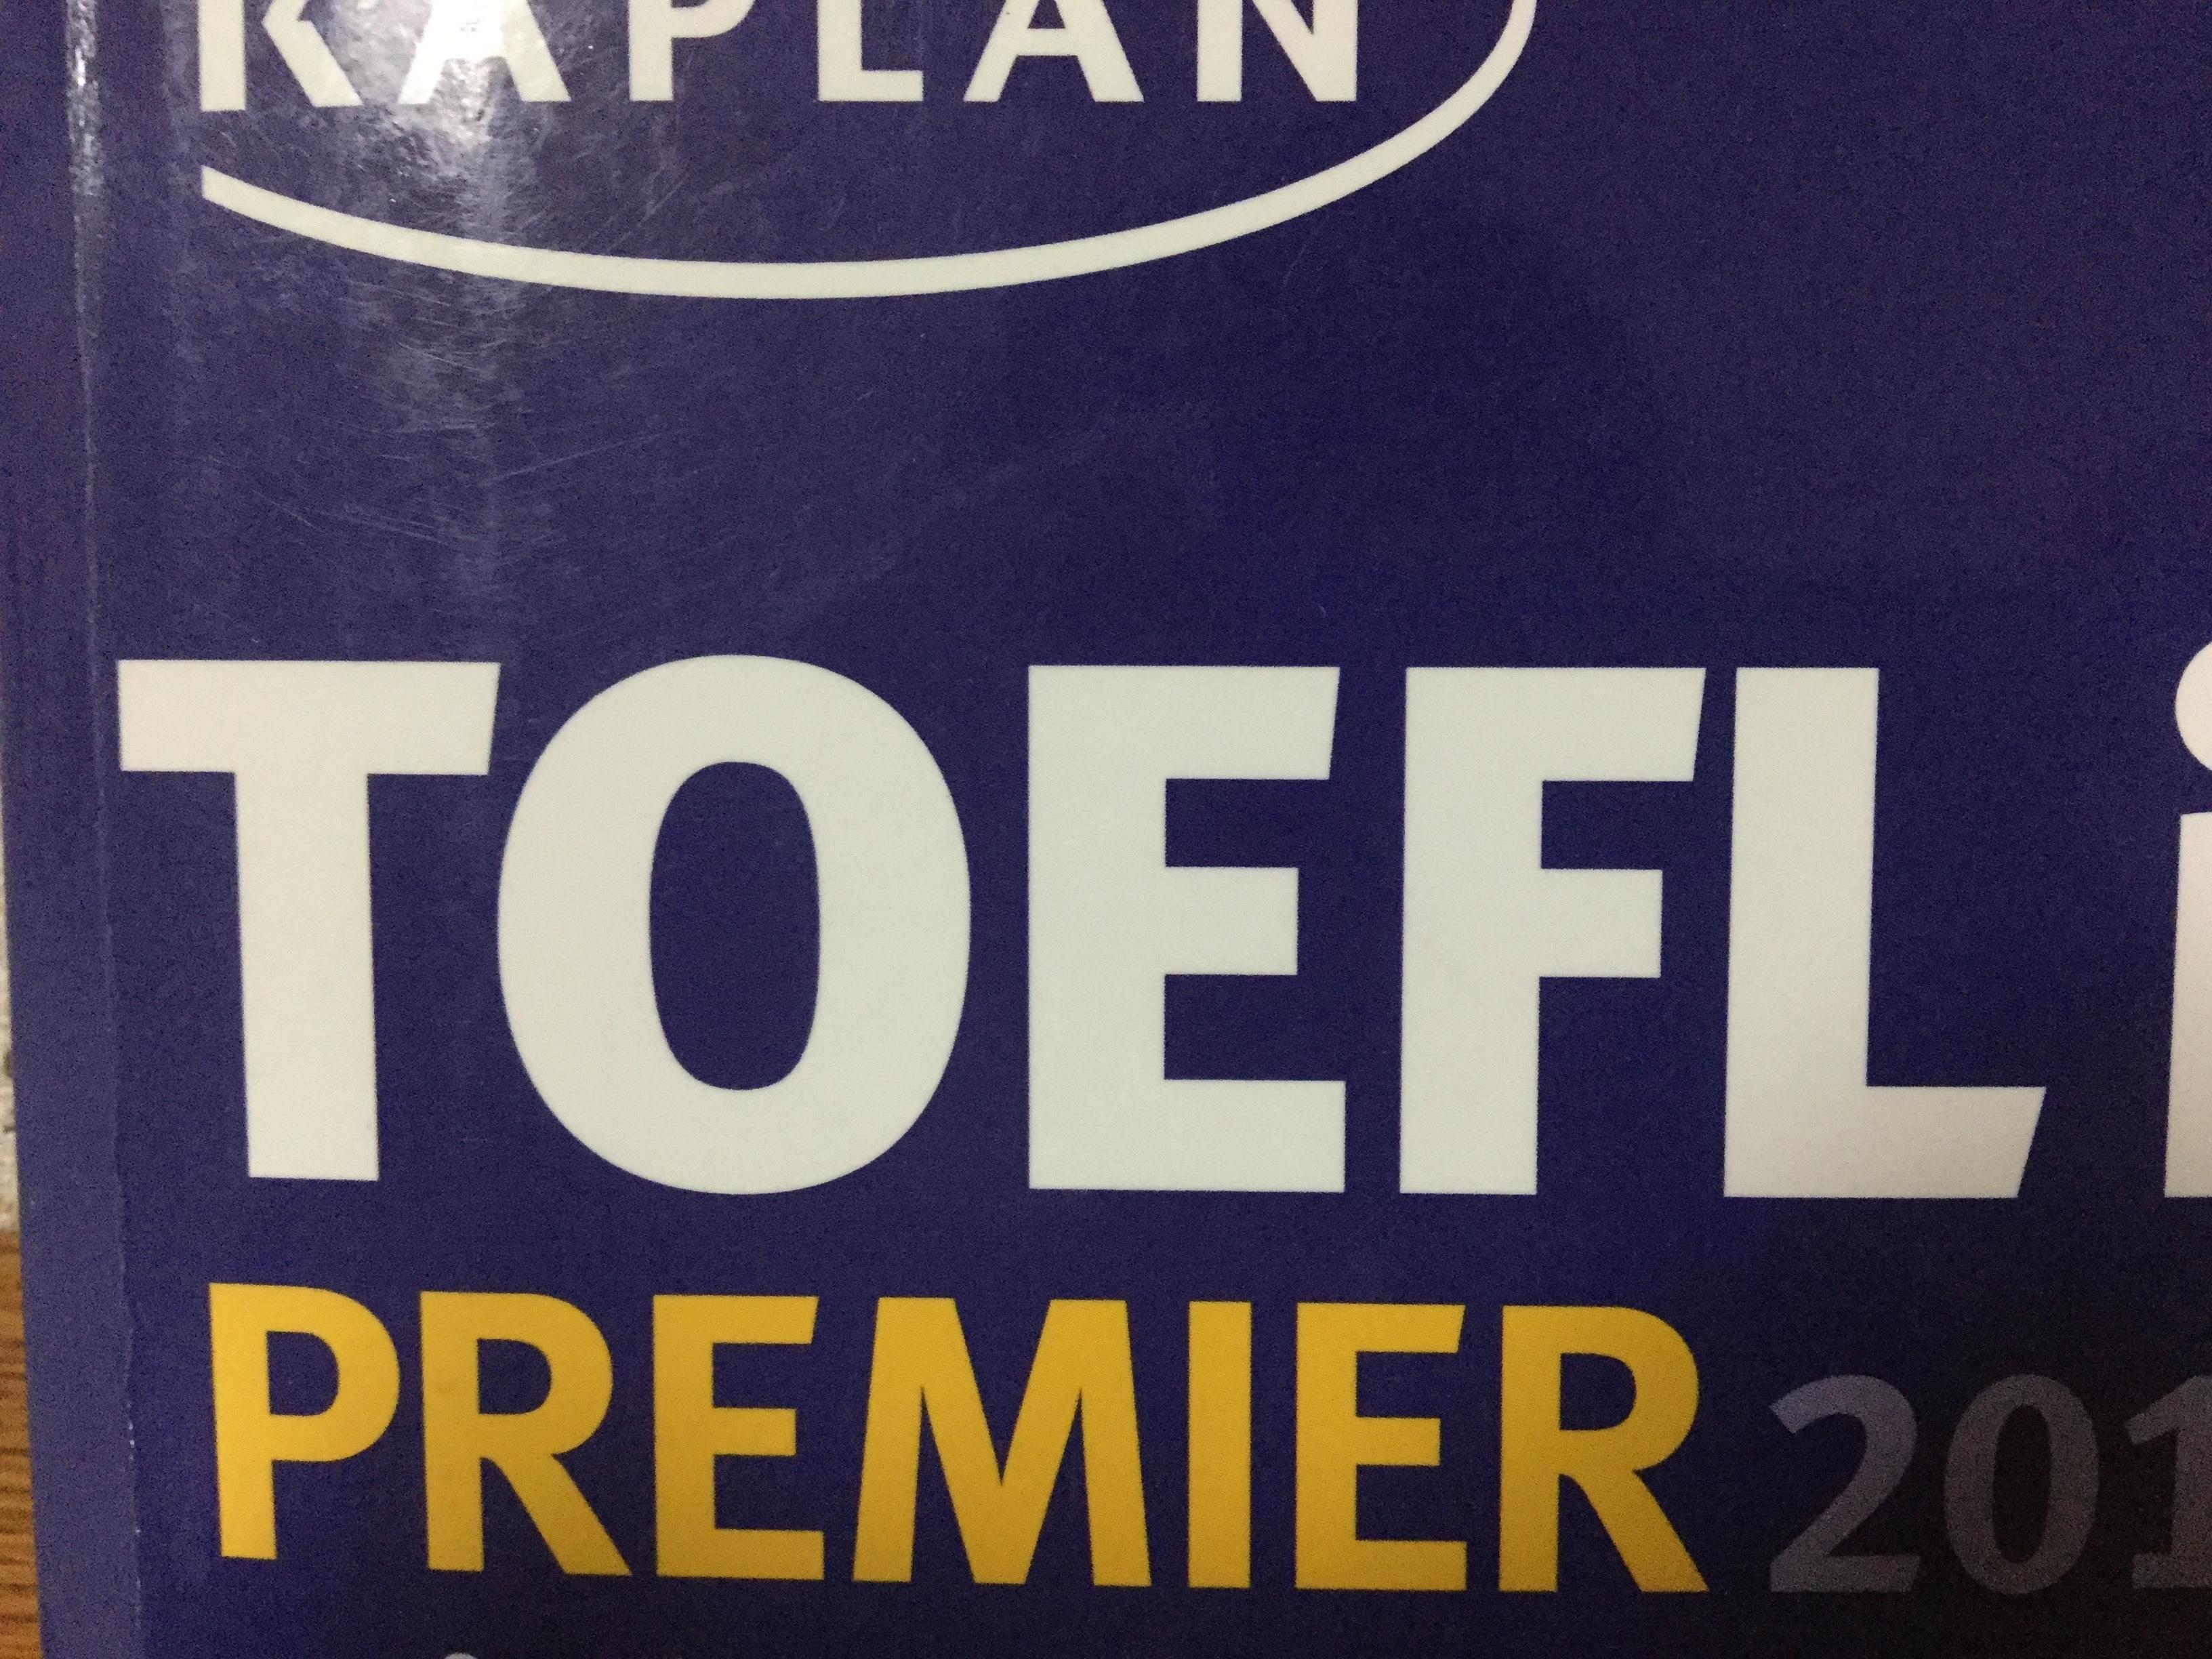 TOEFL PREMIERと書いた写真です。